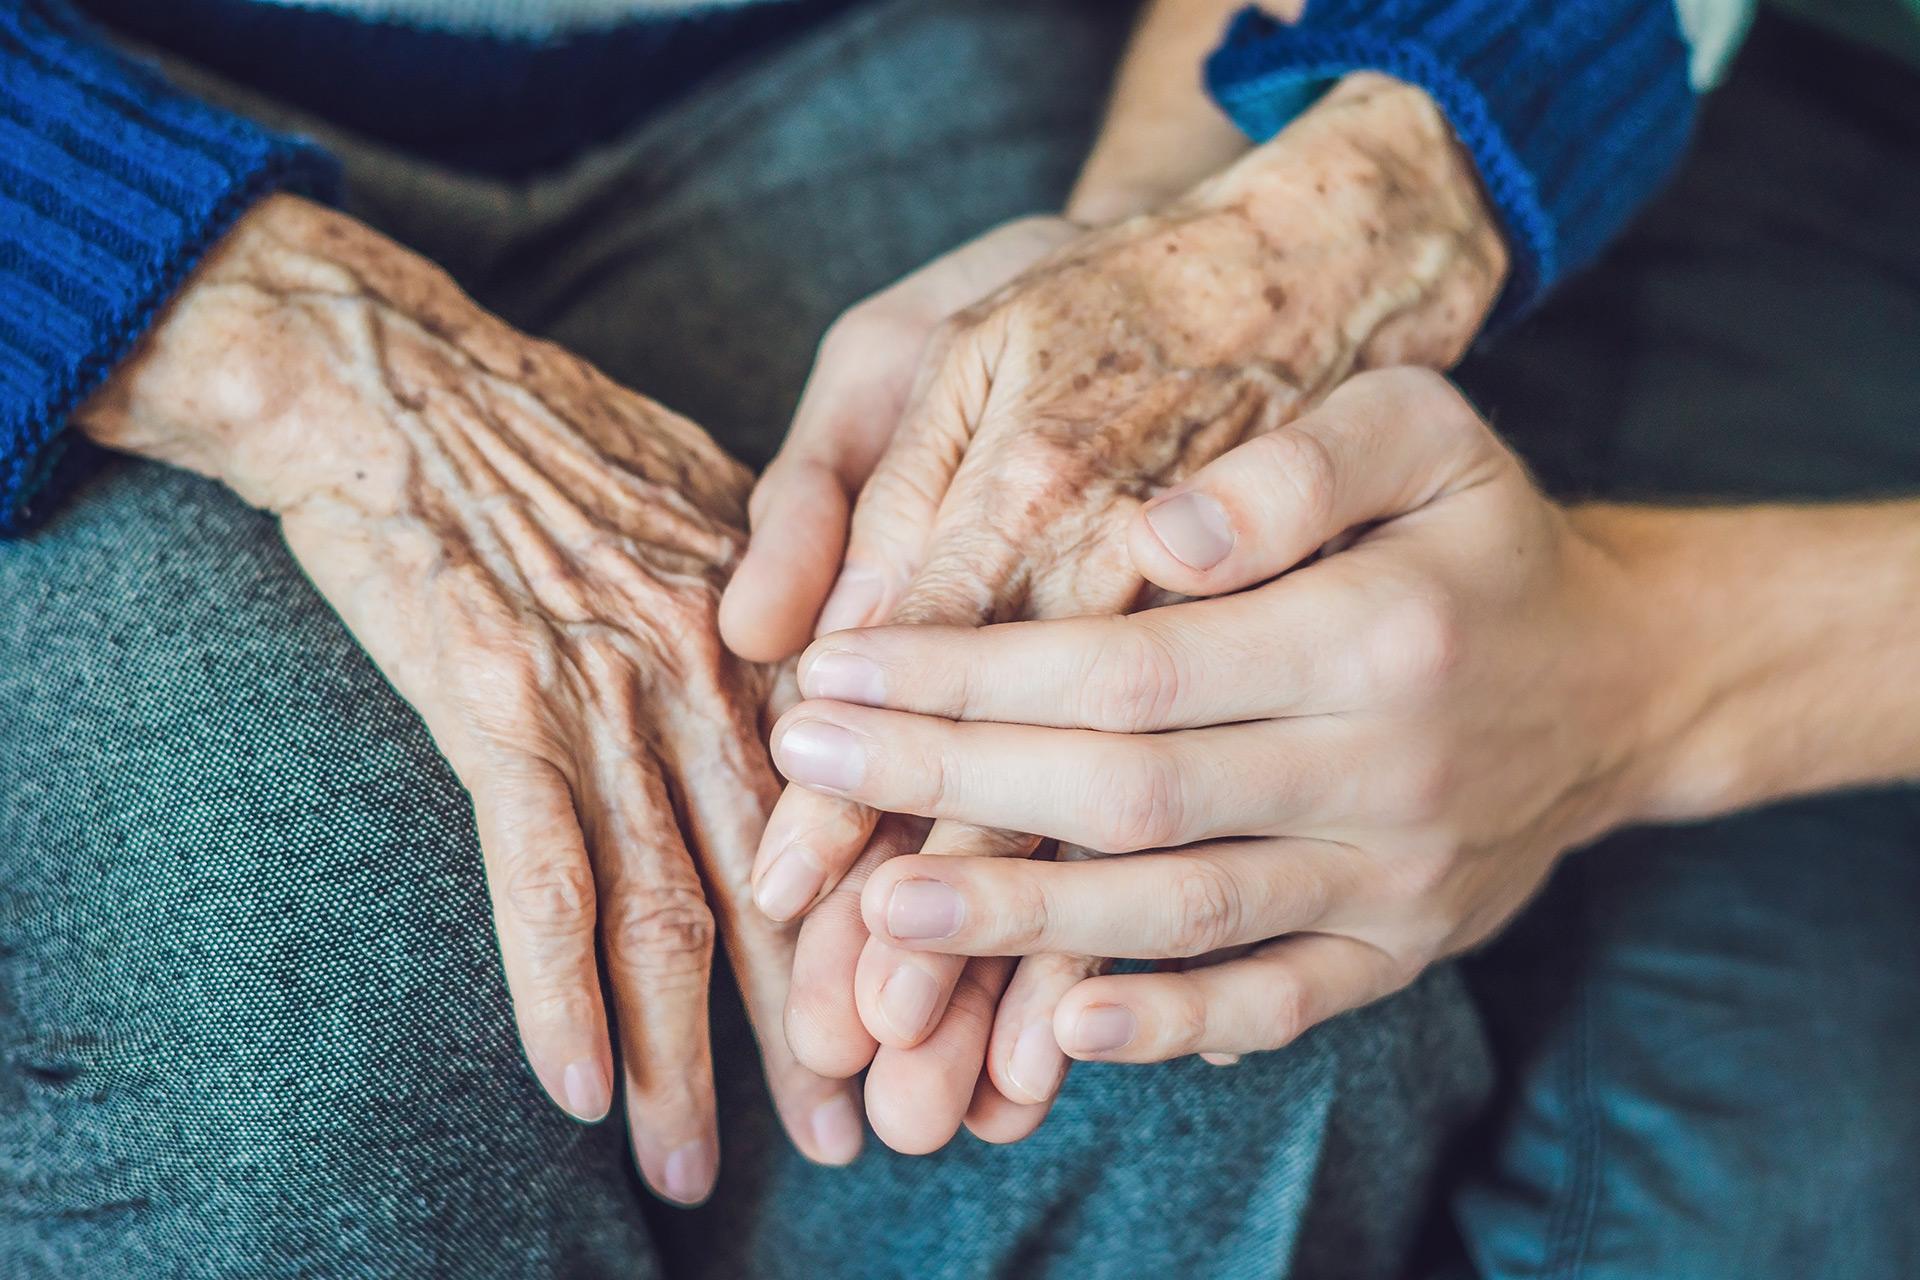 diplomado-bienestar-adulto-mayor-89048215-web